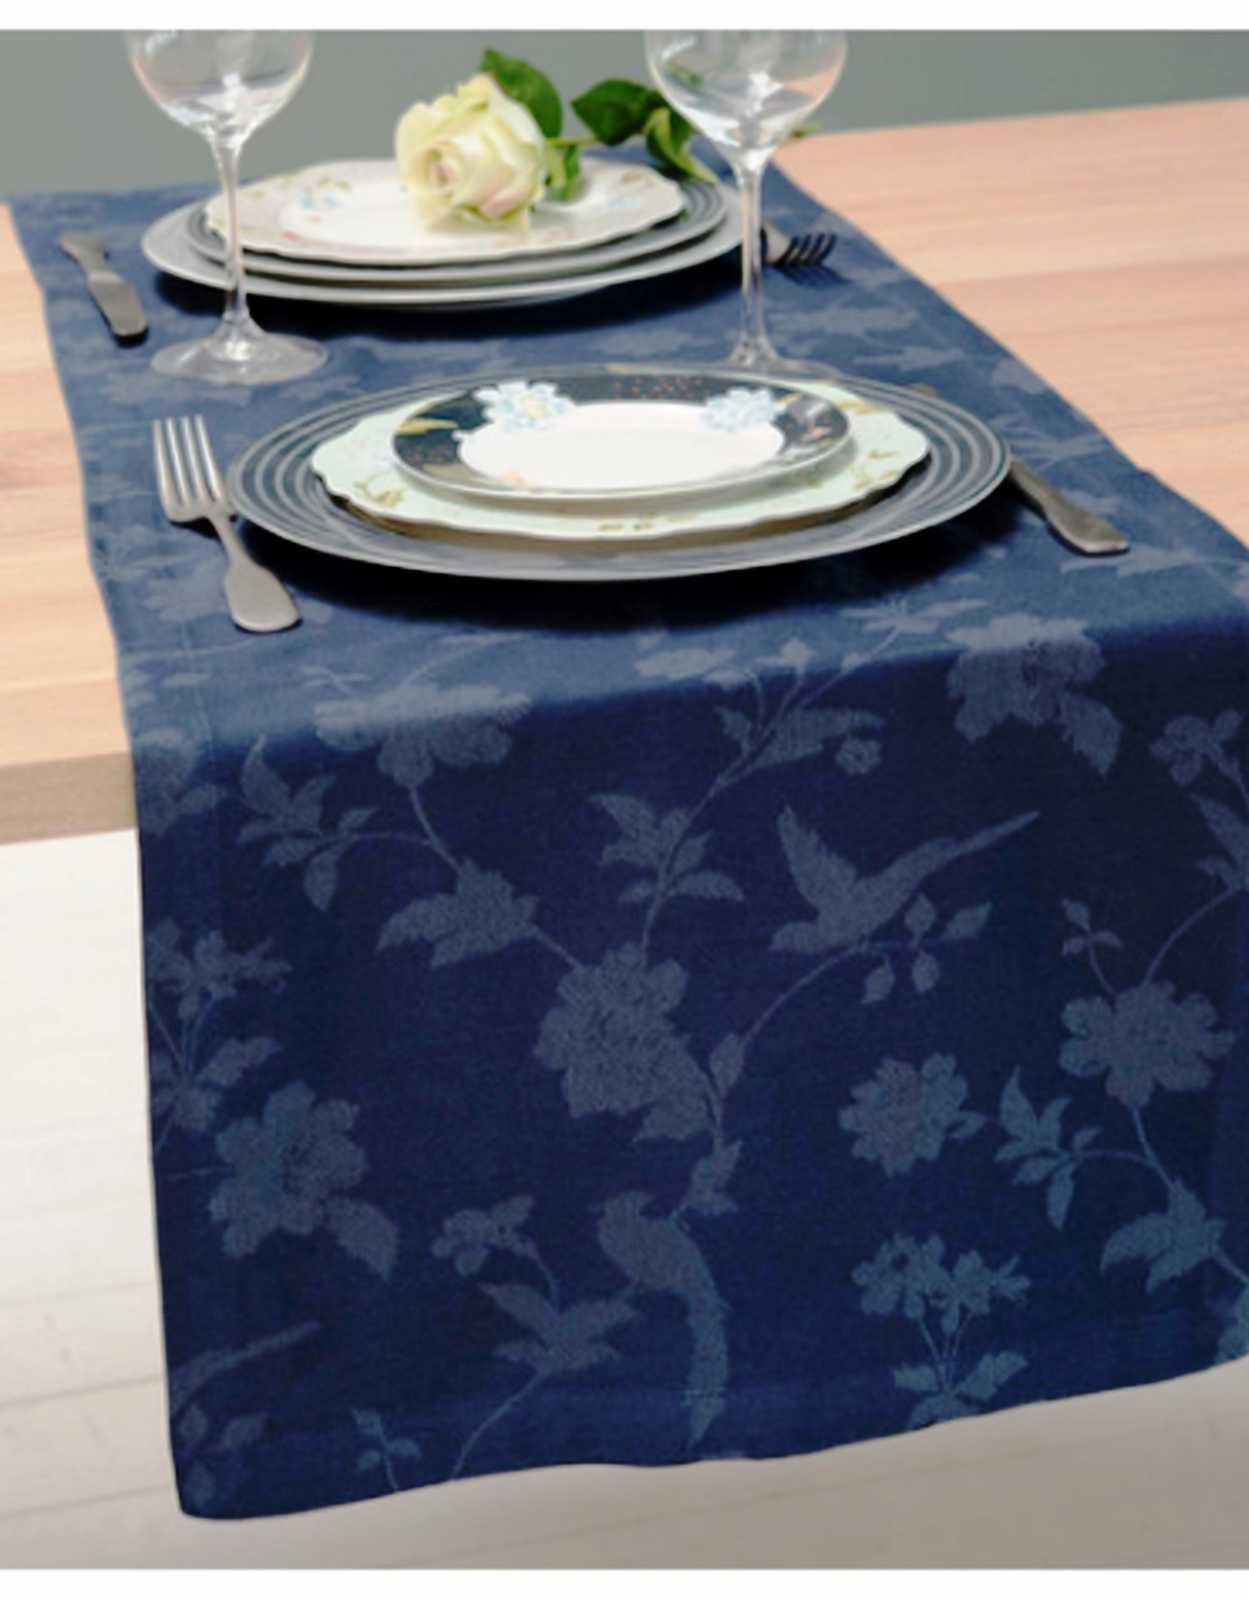 Онлайн каталог PROMENU: Скатерть Laura Ashley HERITAGE, 40х150 см, синий с цветами и птичками                               180999